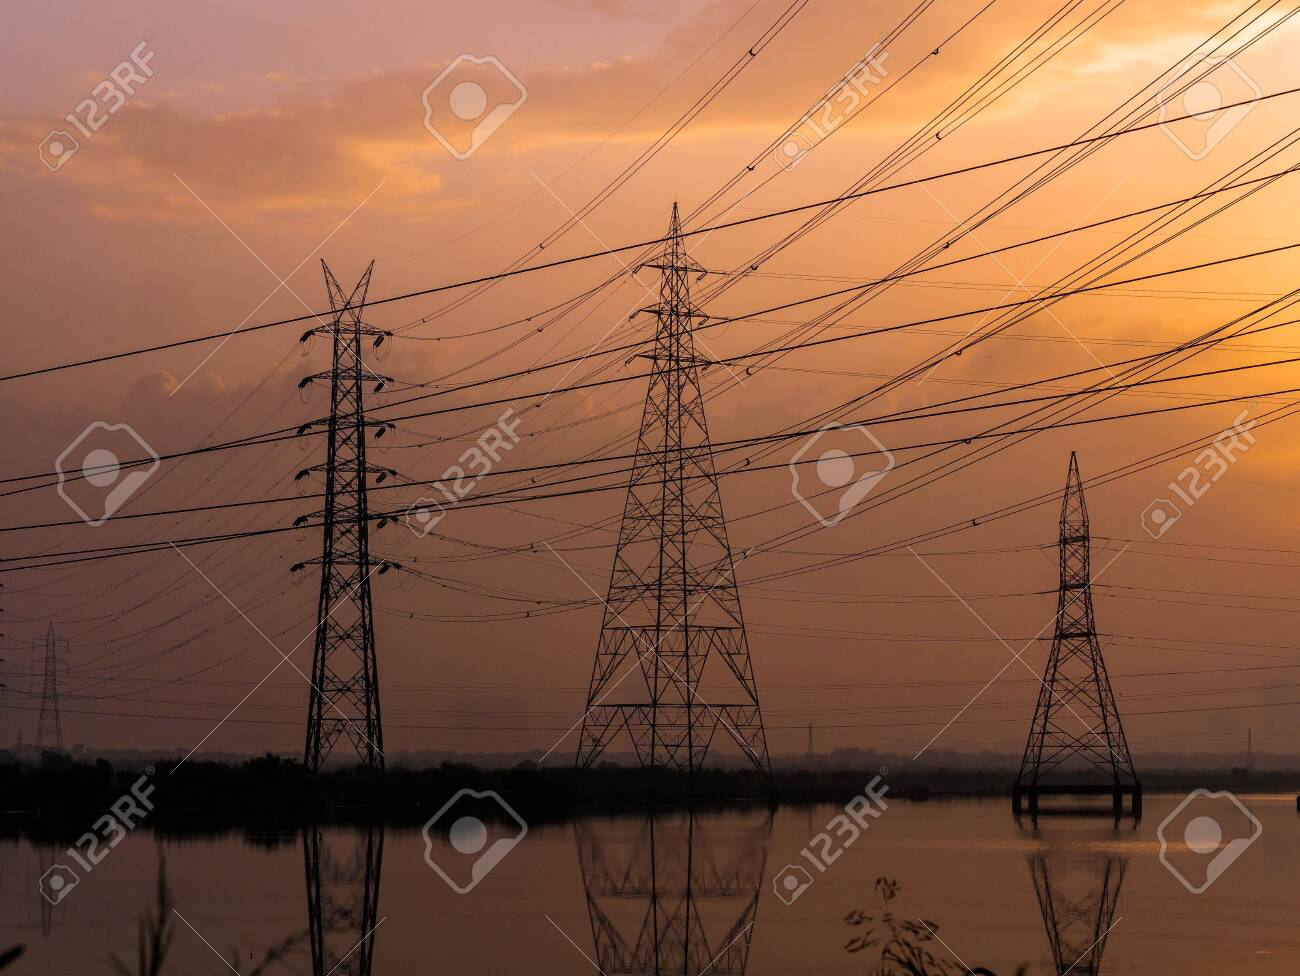 High-voltage power lines at Sunrise/sunset. electricity distribution station.Saltpans in Mumbai. - 156412991